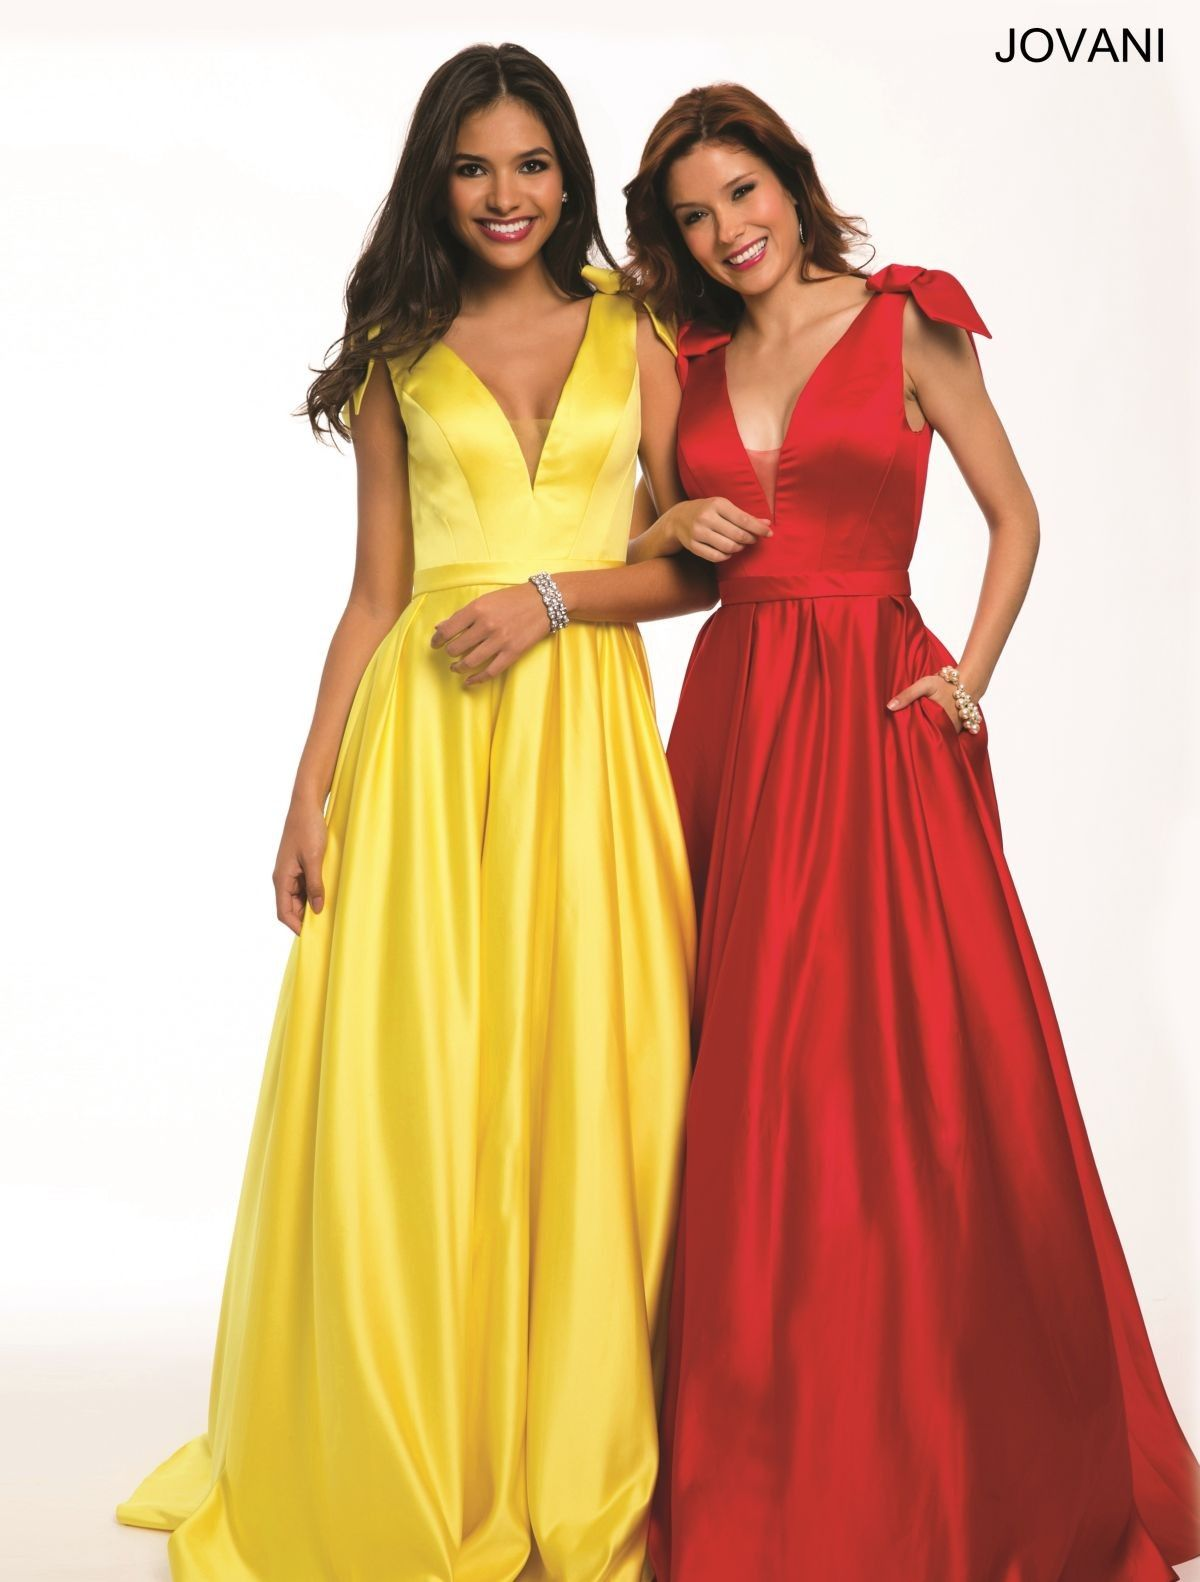 Jovanidress vestido da ni pinterest jovani dresses